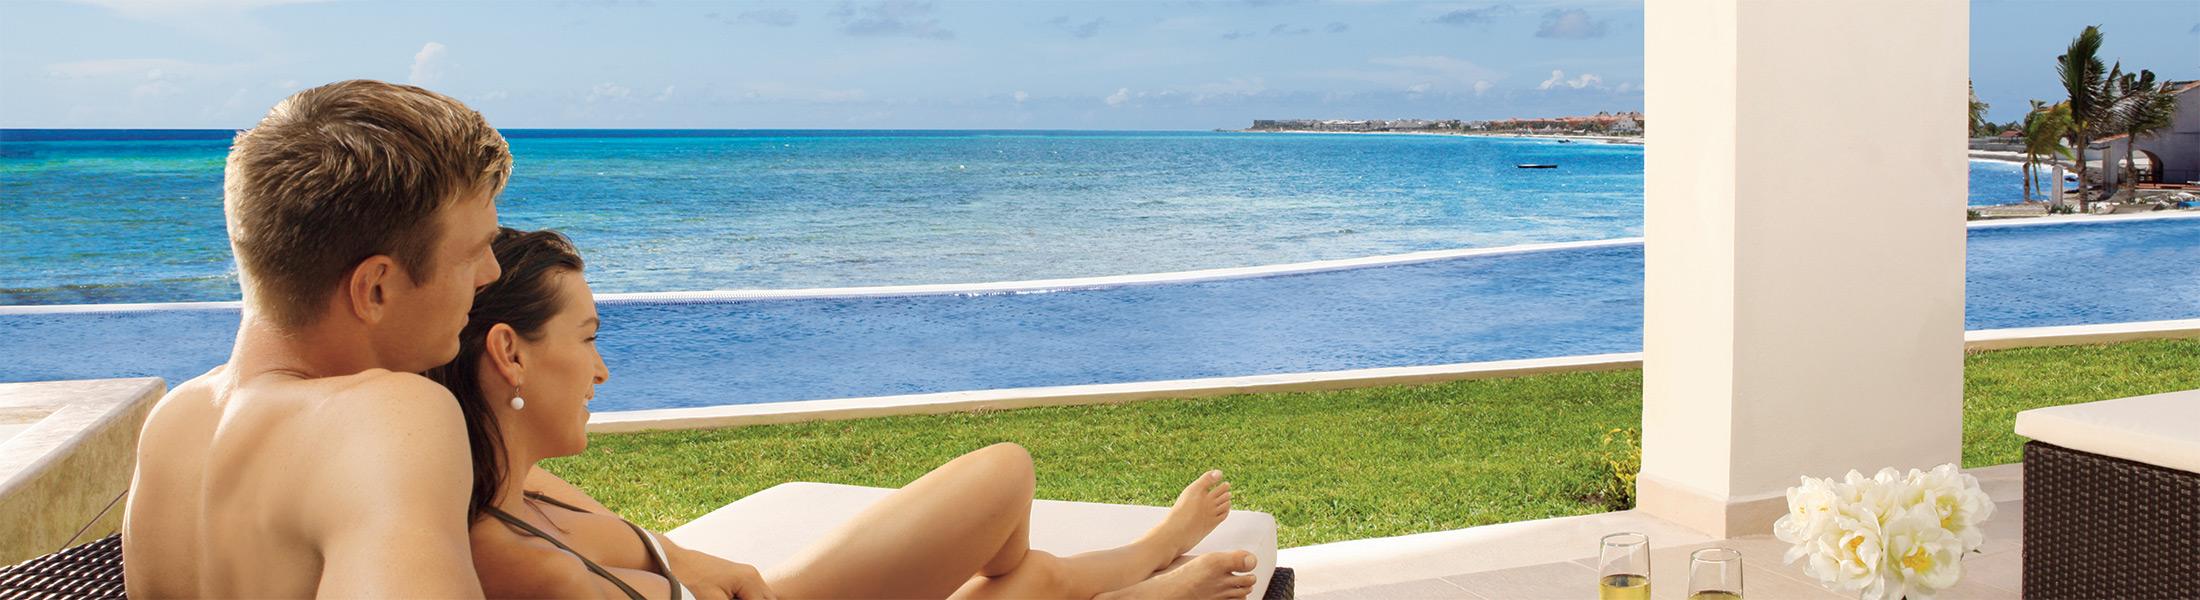 Couple on a sun lounge overlooking the ocean at Secrets Silversands Riviera